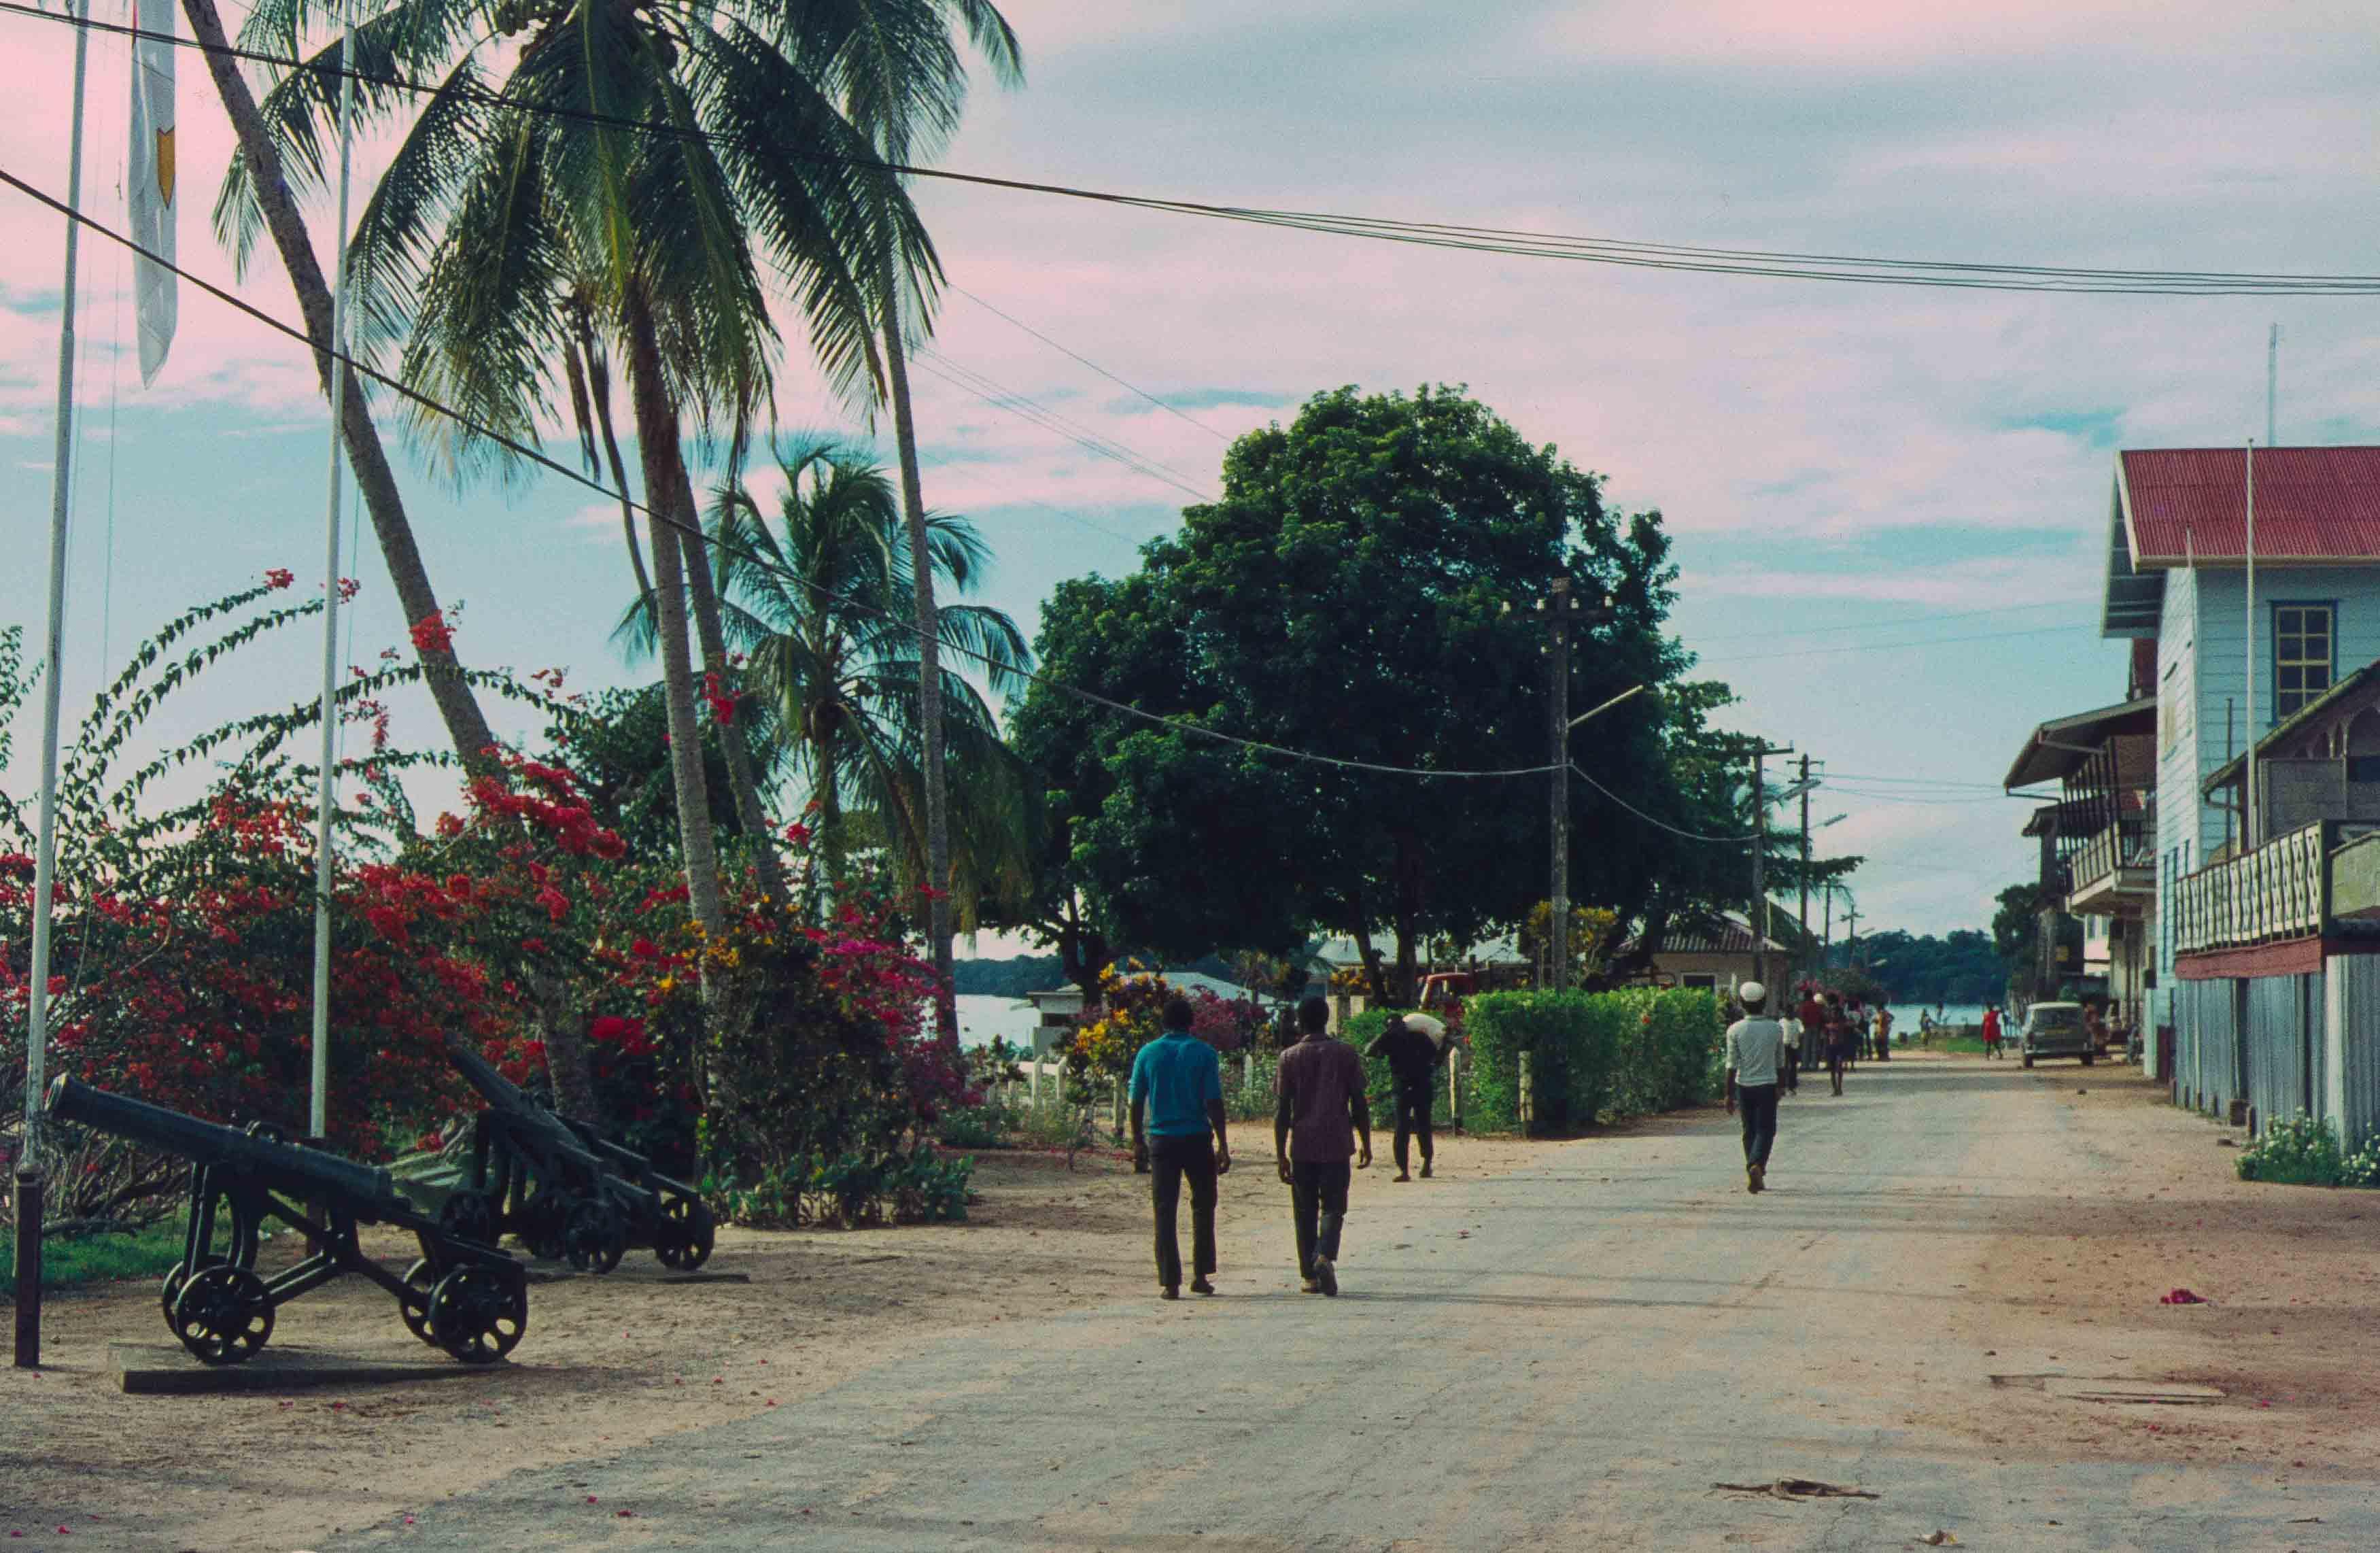 384. Suriname